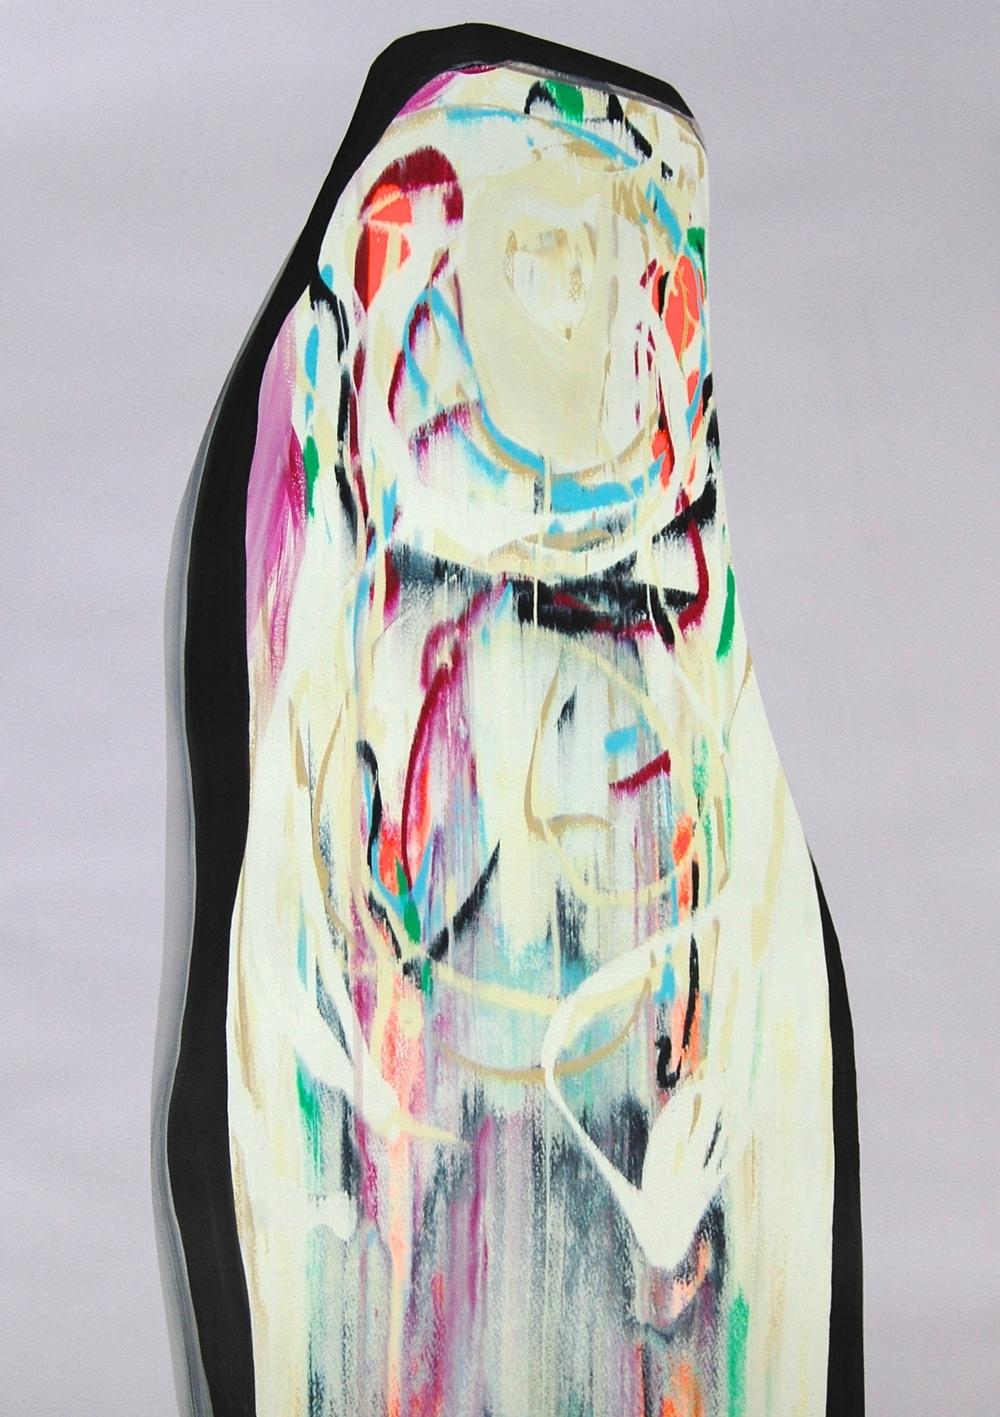 Lee Knott Kokomo 70 x 50 cms acrylic on paper £950   Enquire